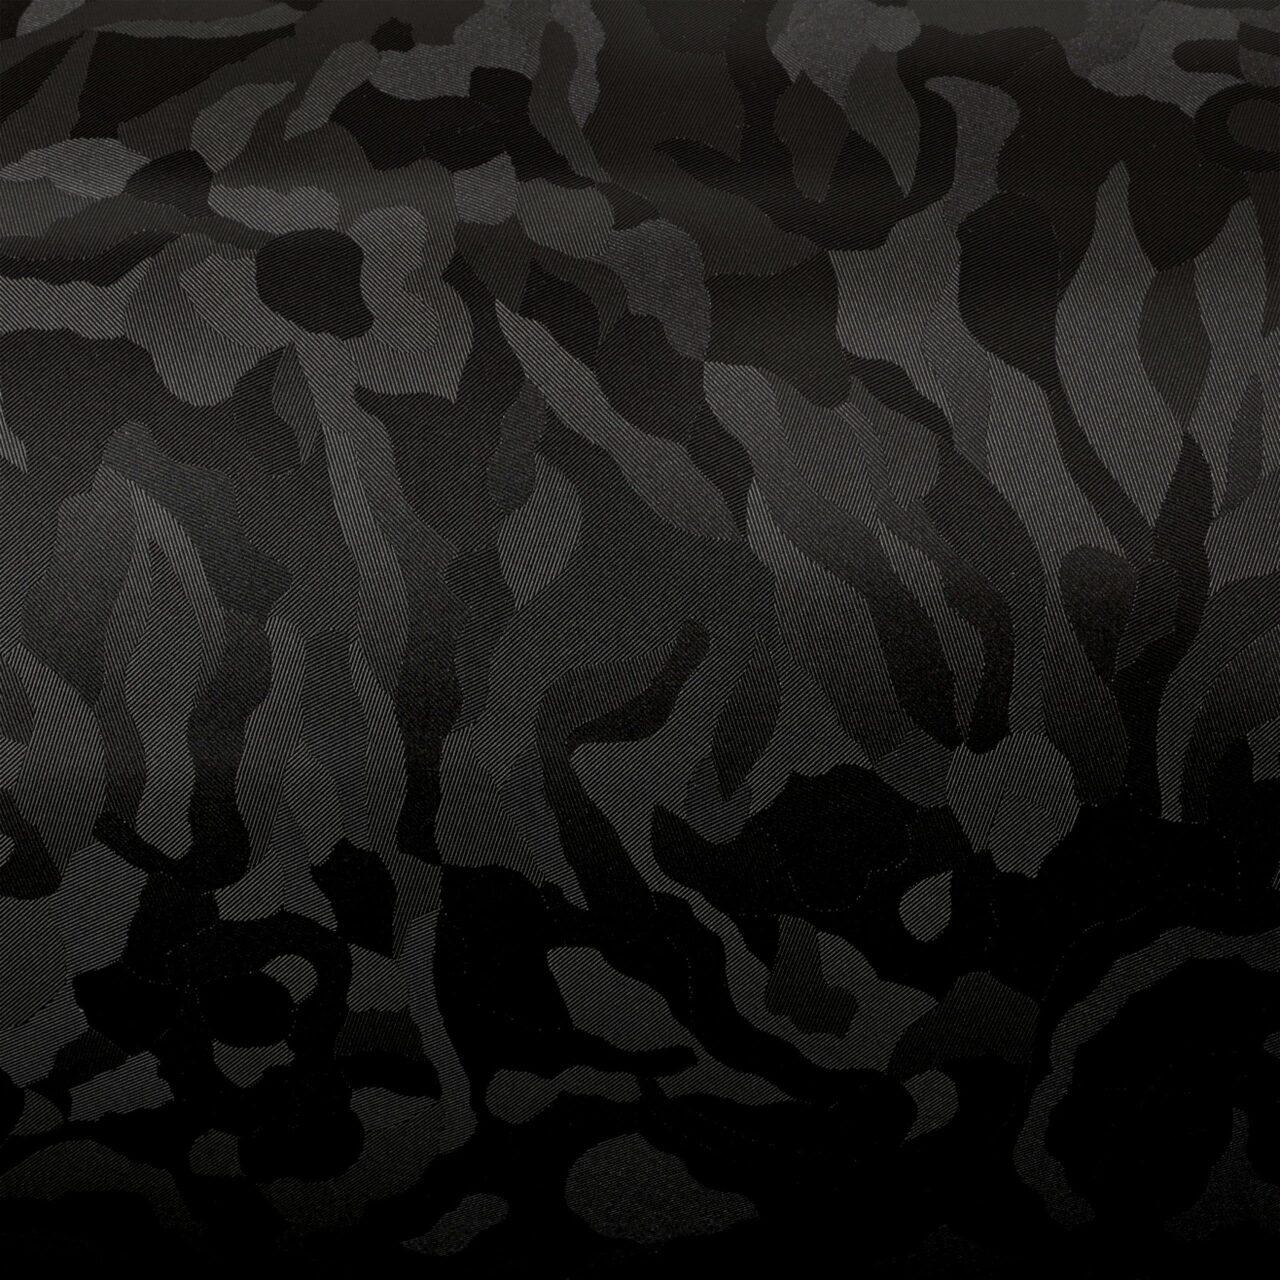 76210-3M-Wrap-Folie-1080-SB12-Shadow-Black_513